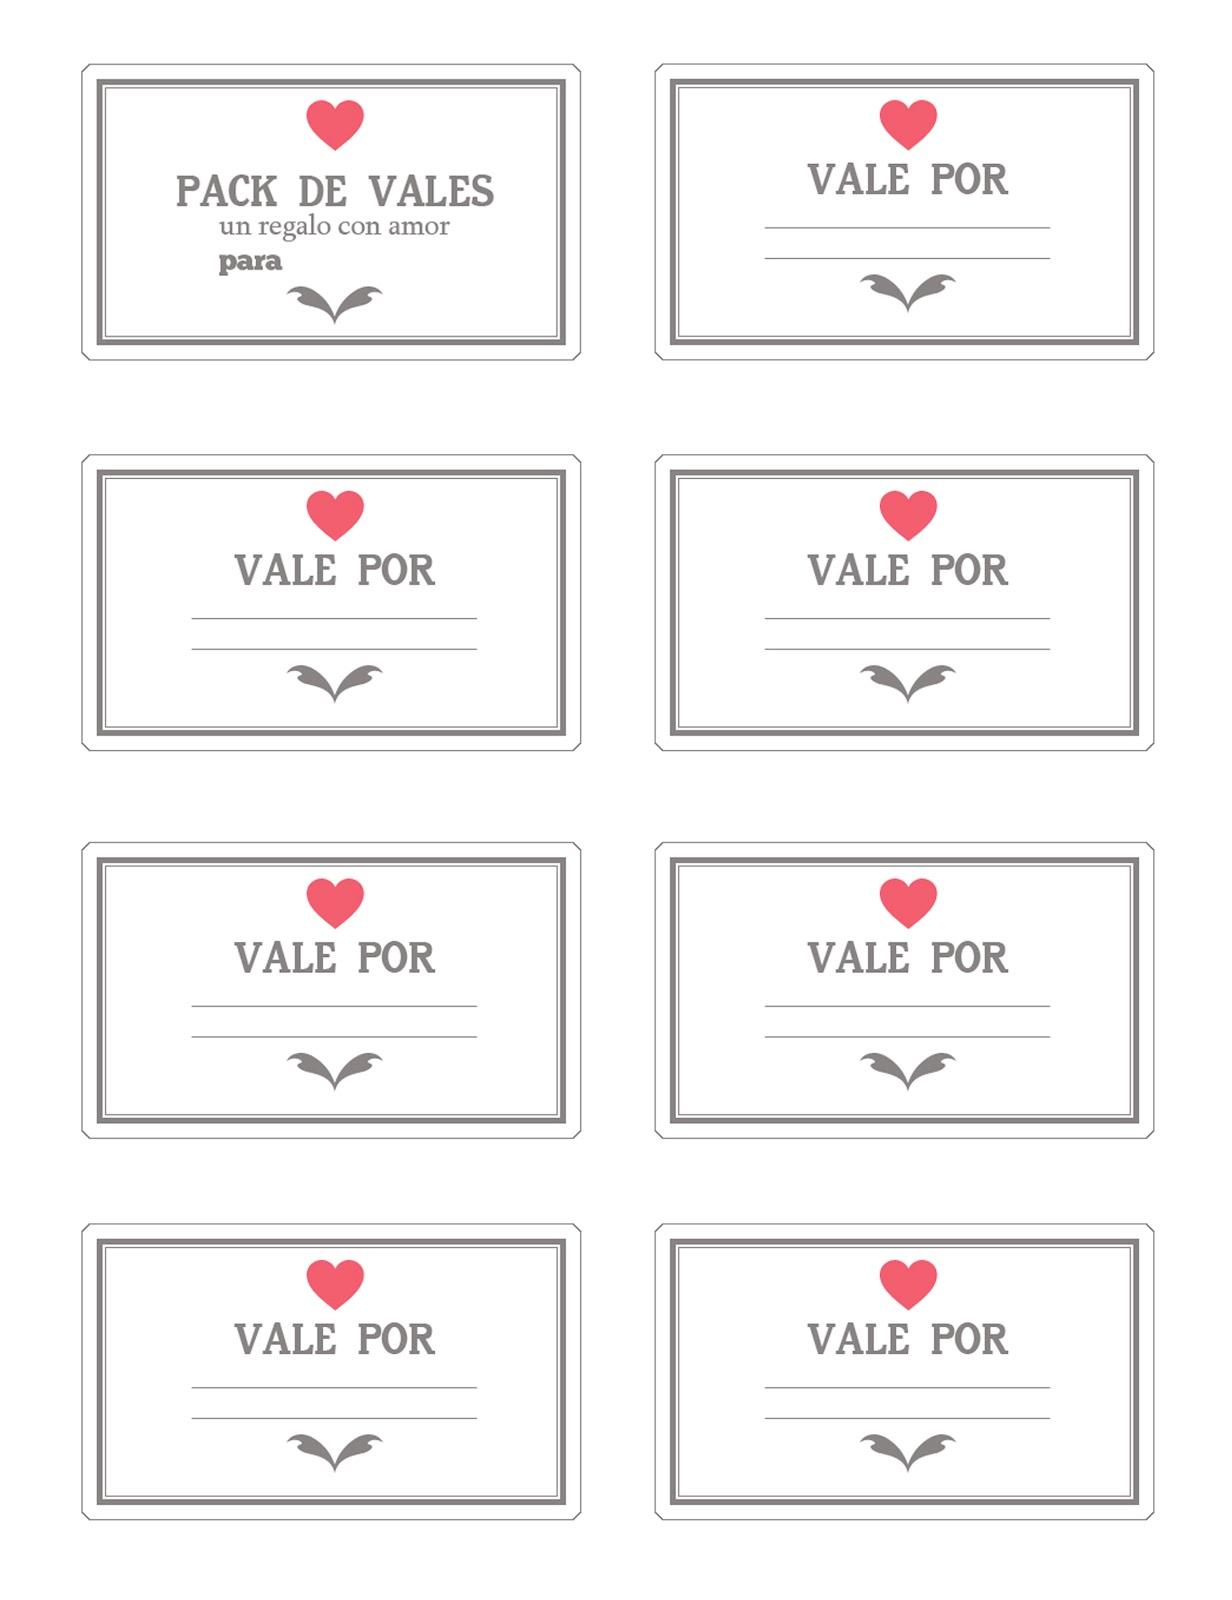 http://www.milowcostblog.com/2012/02/imprimible-vales-para-san-valentin.html